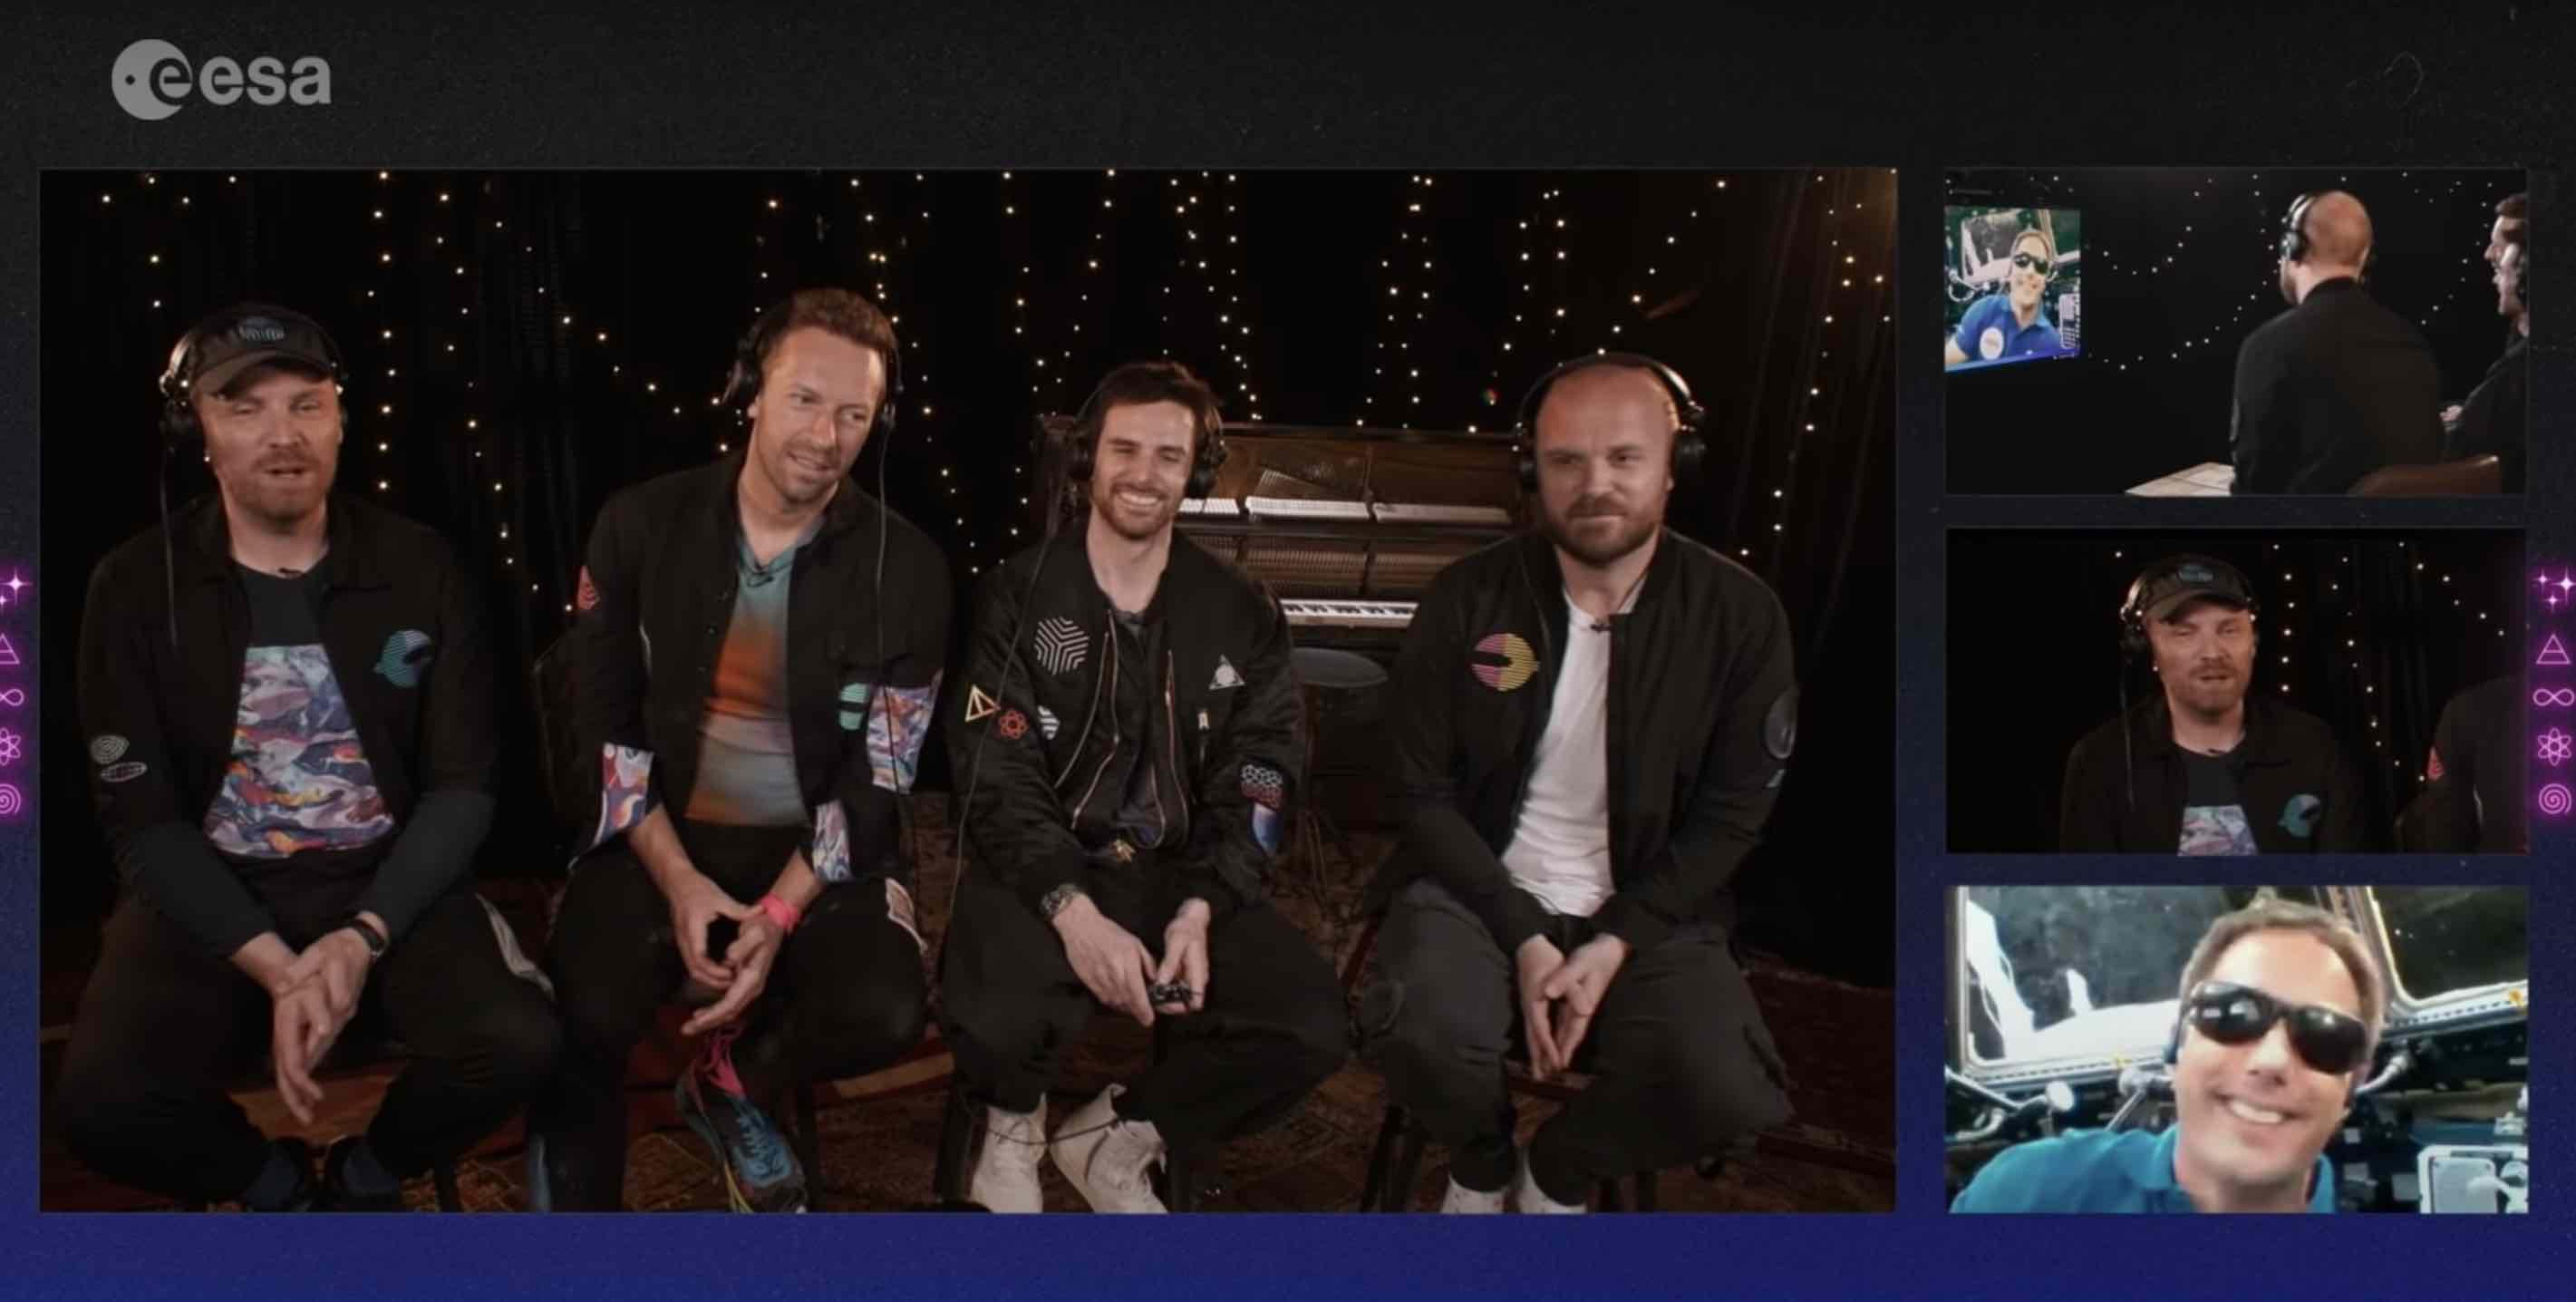 Coldplay - Higher Power - Thomas Pesquet -